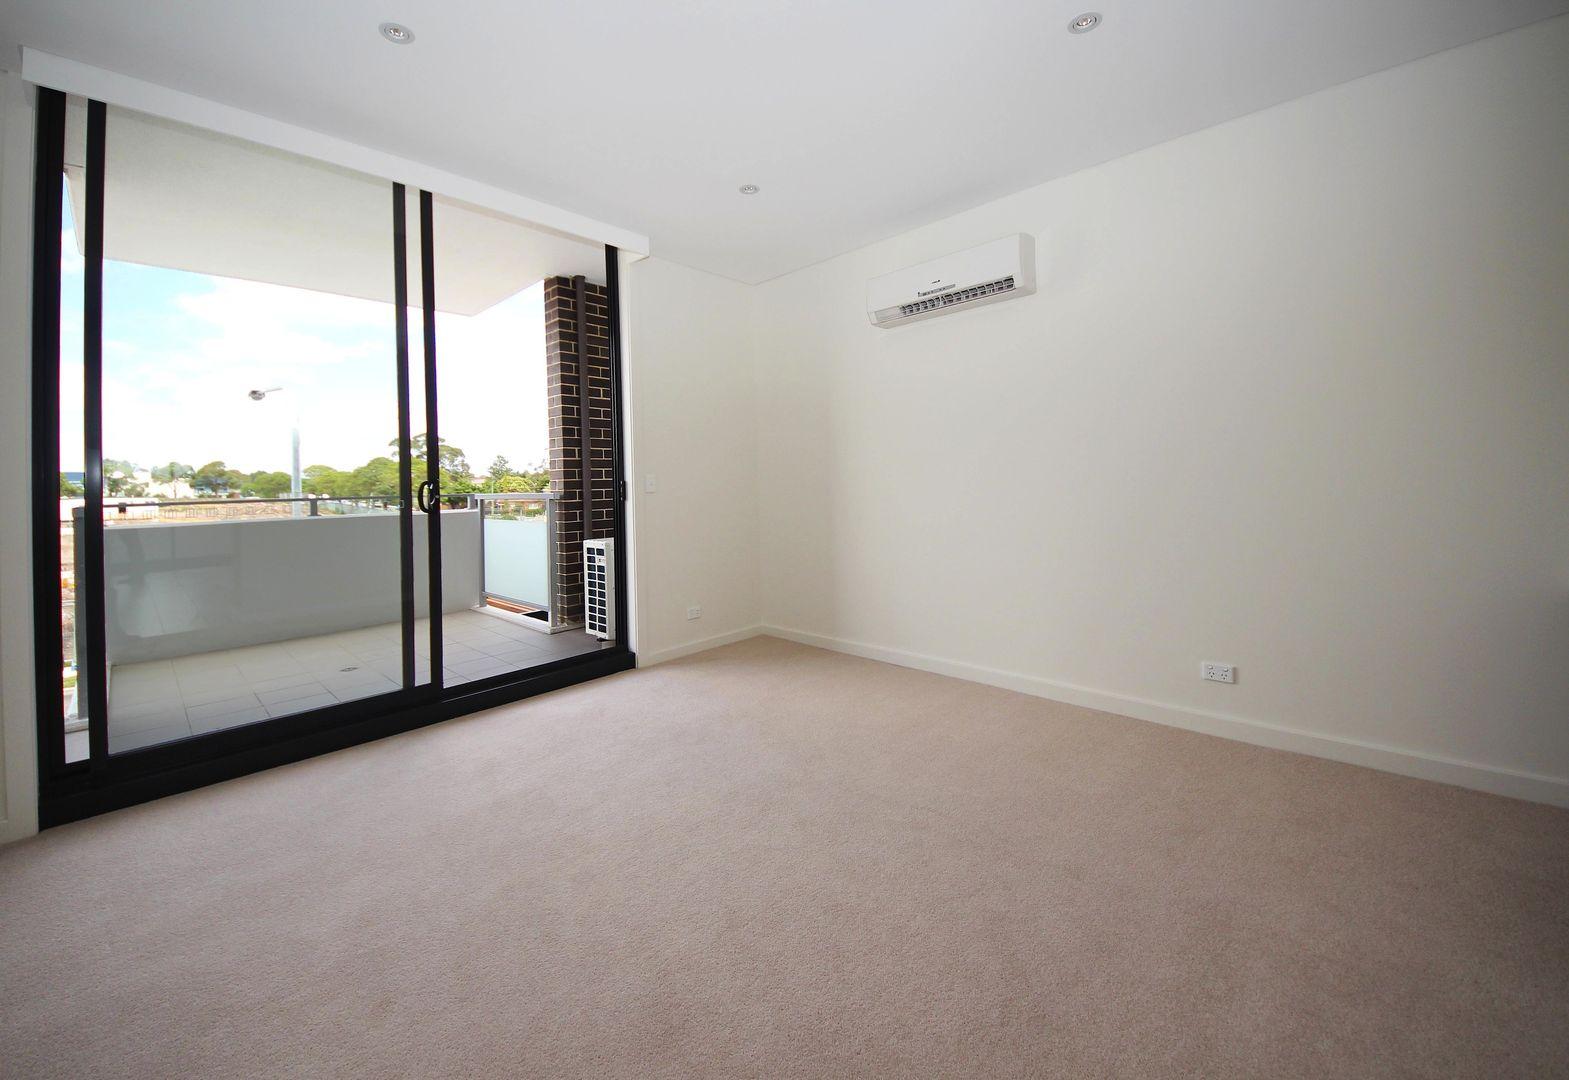 6/12 Victa Street, Clemton Park NSW 2206, Image 1